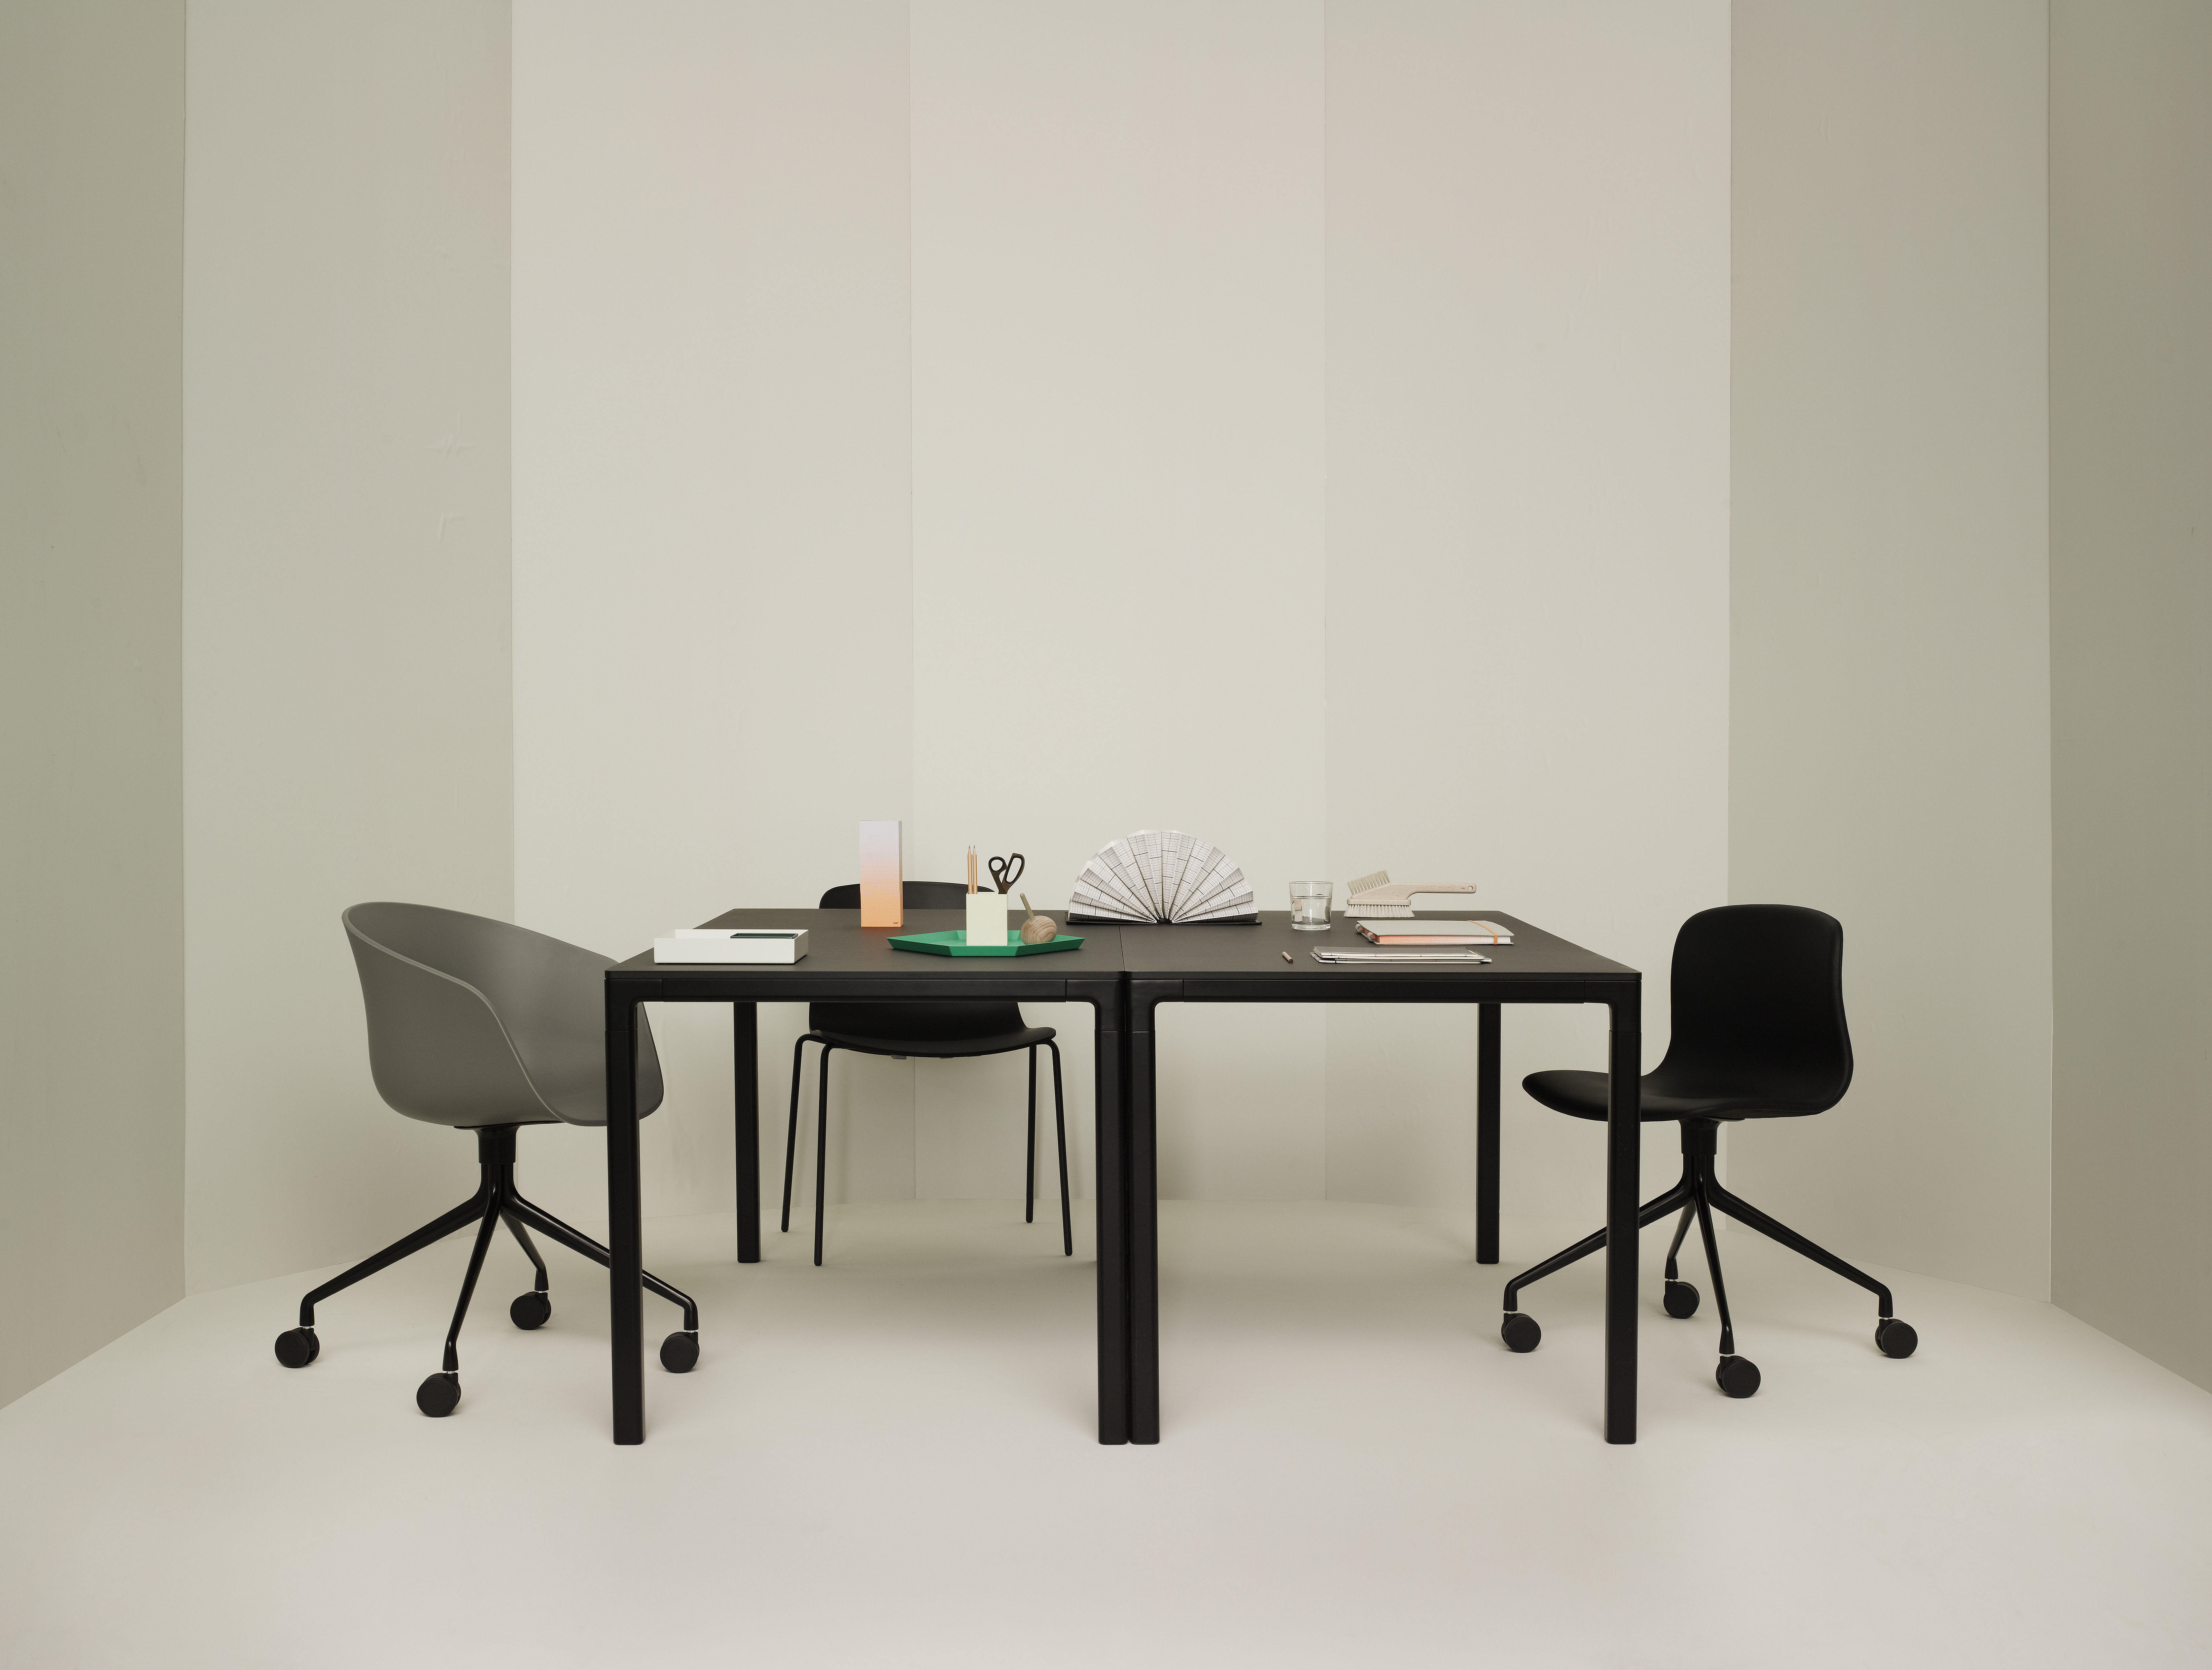 About A Chair Aac14 Drehstuhl Hay Stuhl Mit Rollen